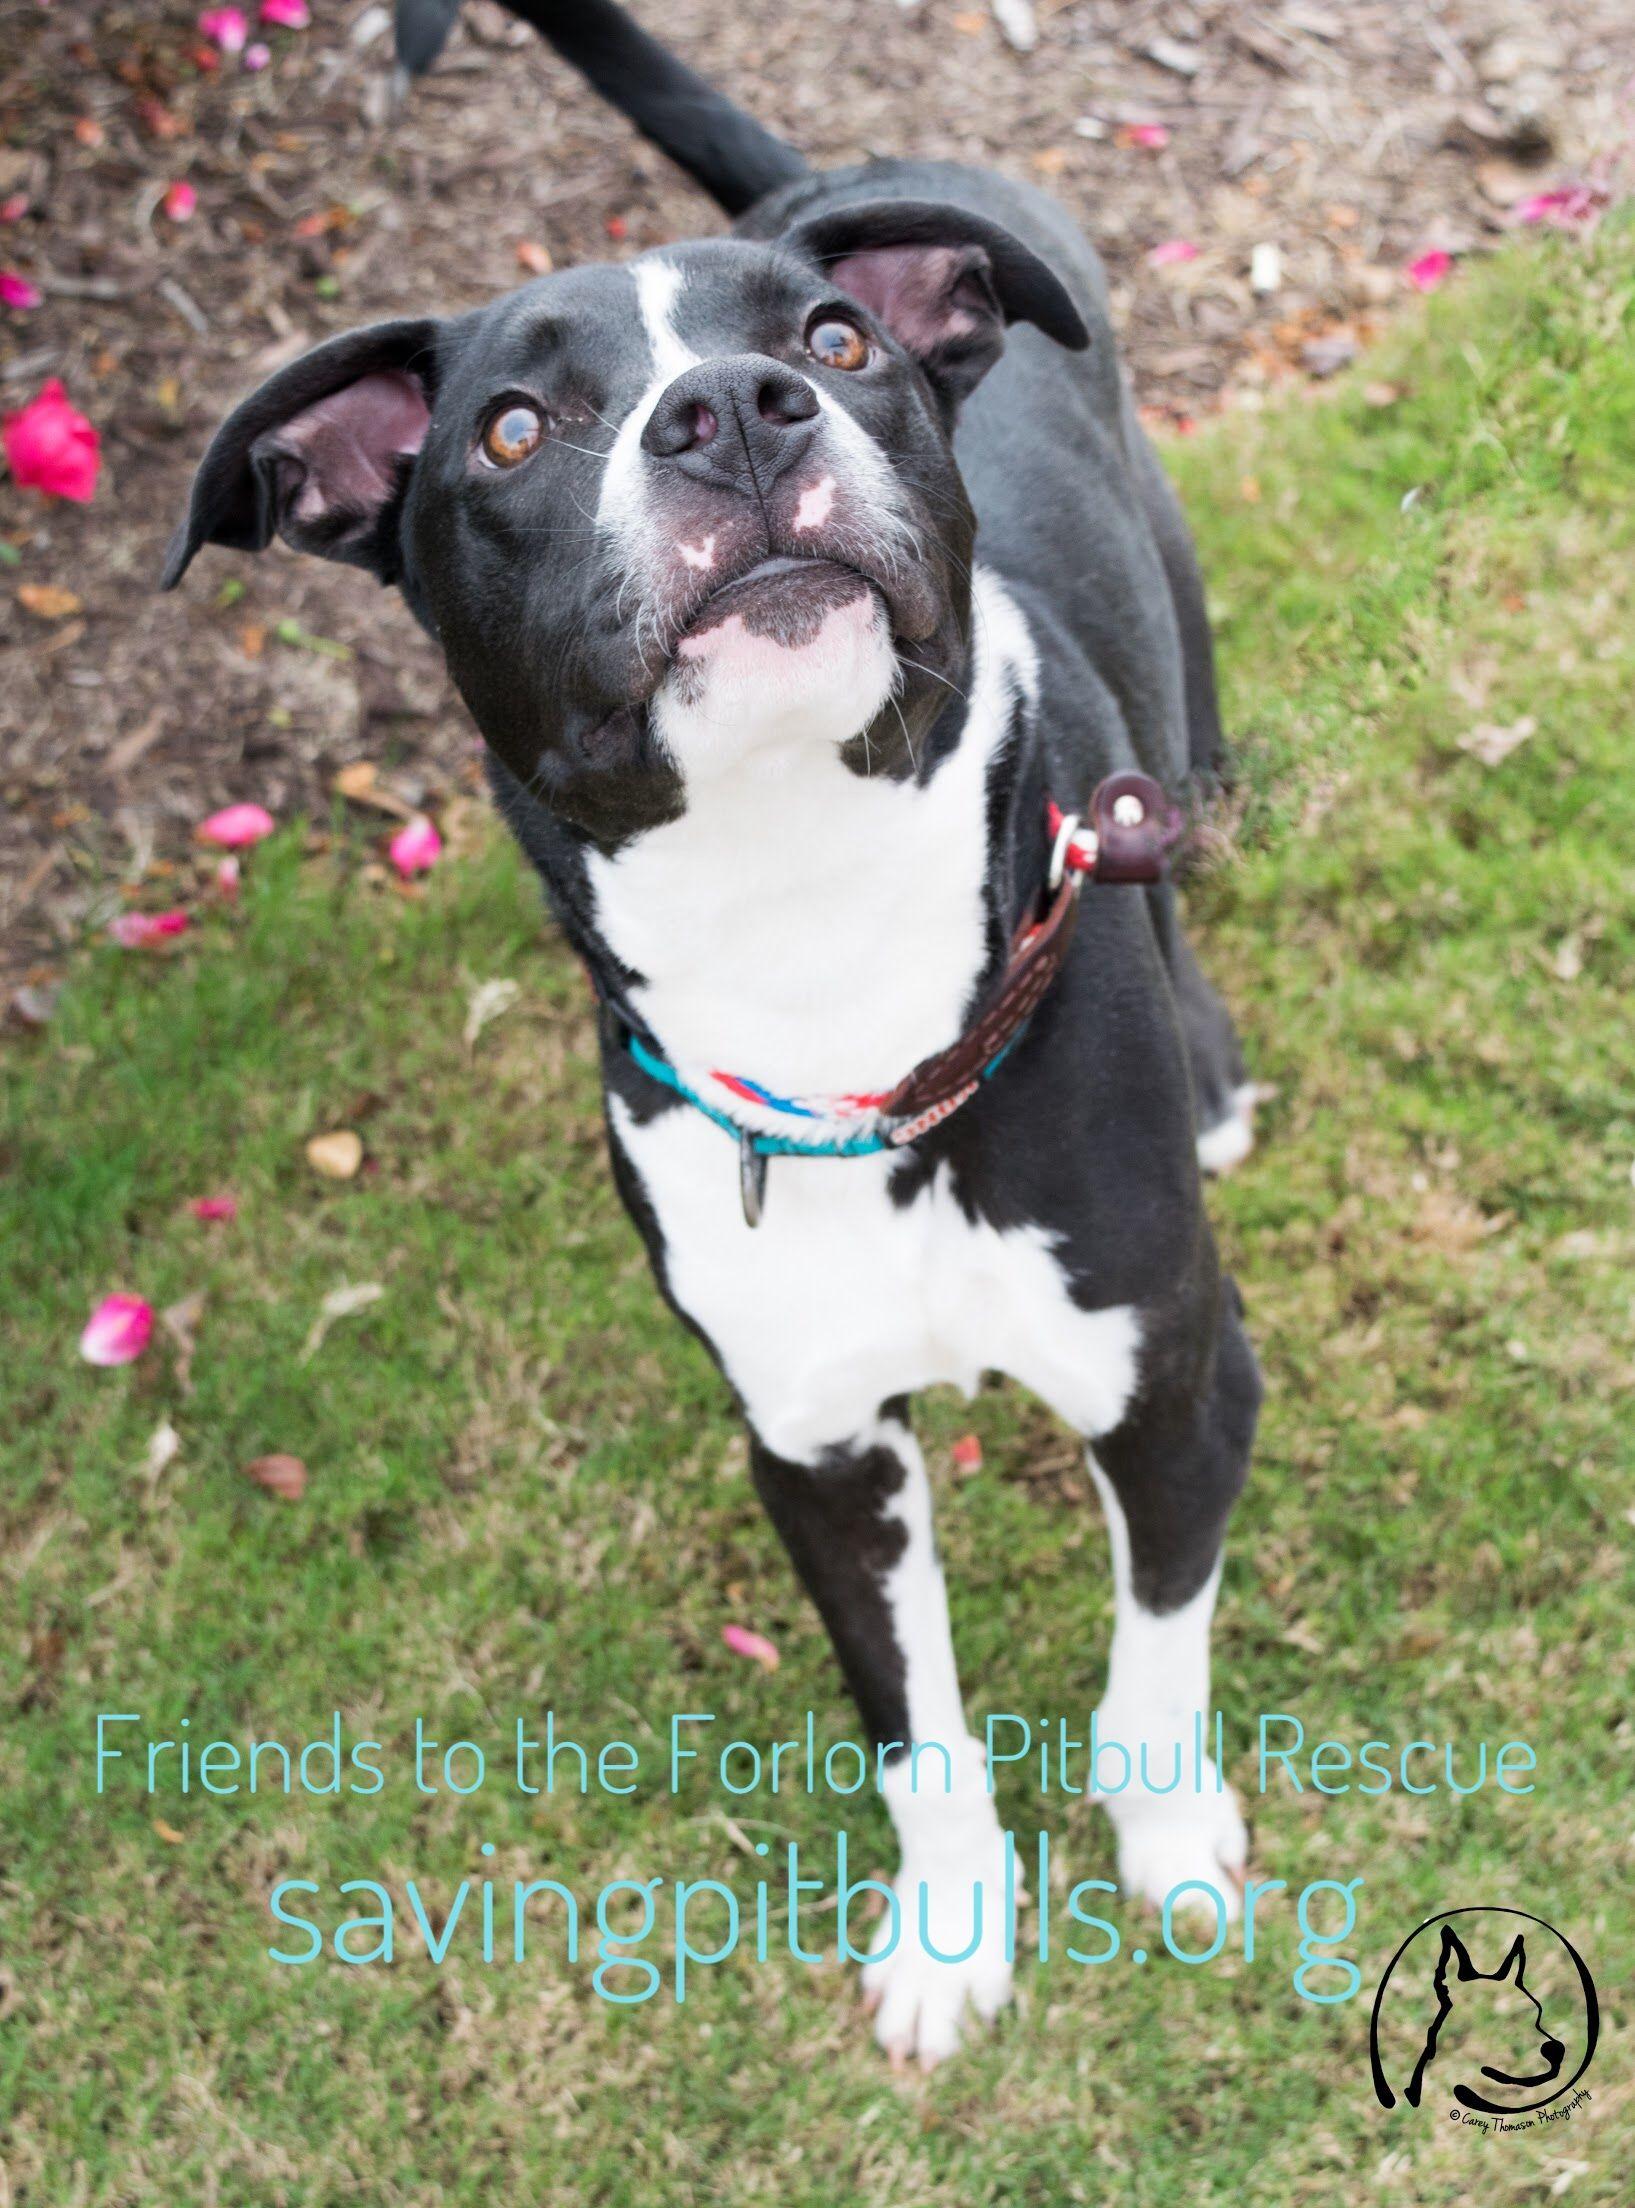 Adopt A Bulls Pitbull Terrier Adoption Mixed Breed